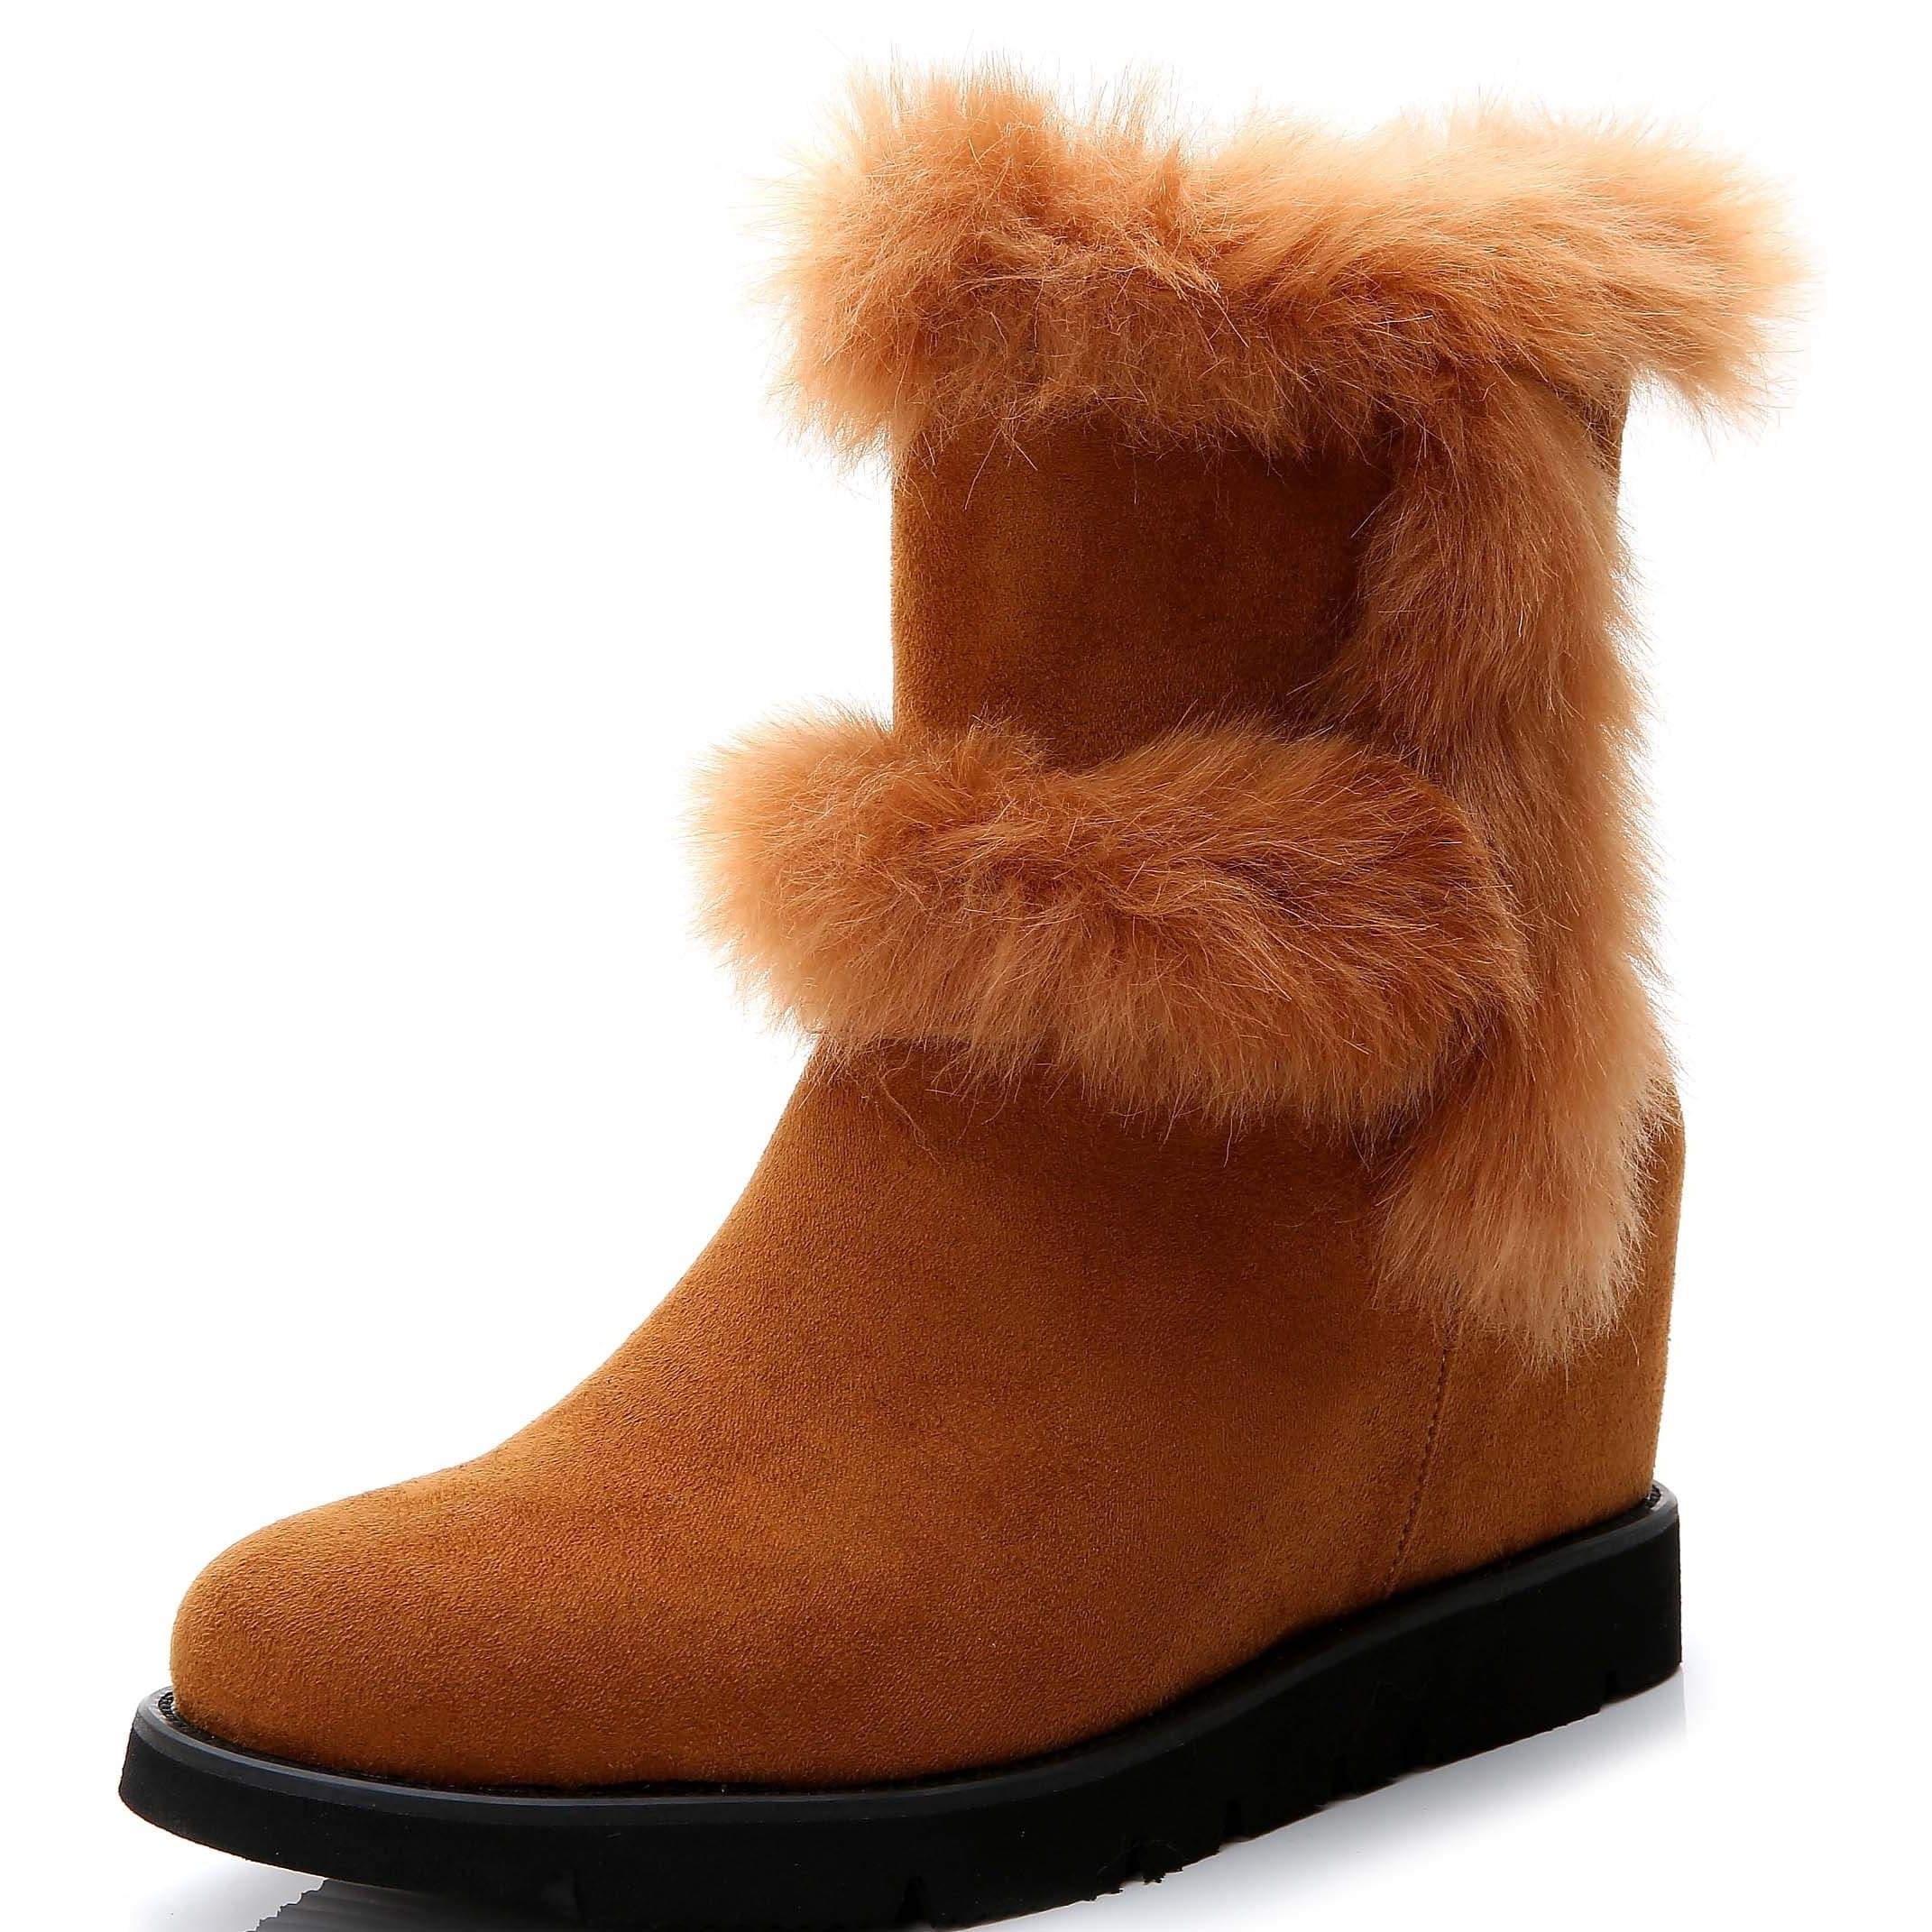 Buy Yellow Women\'s Boots Online at Overstock.com | Our Best Women\'s ...